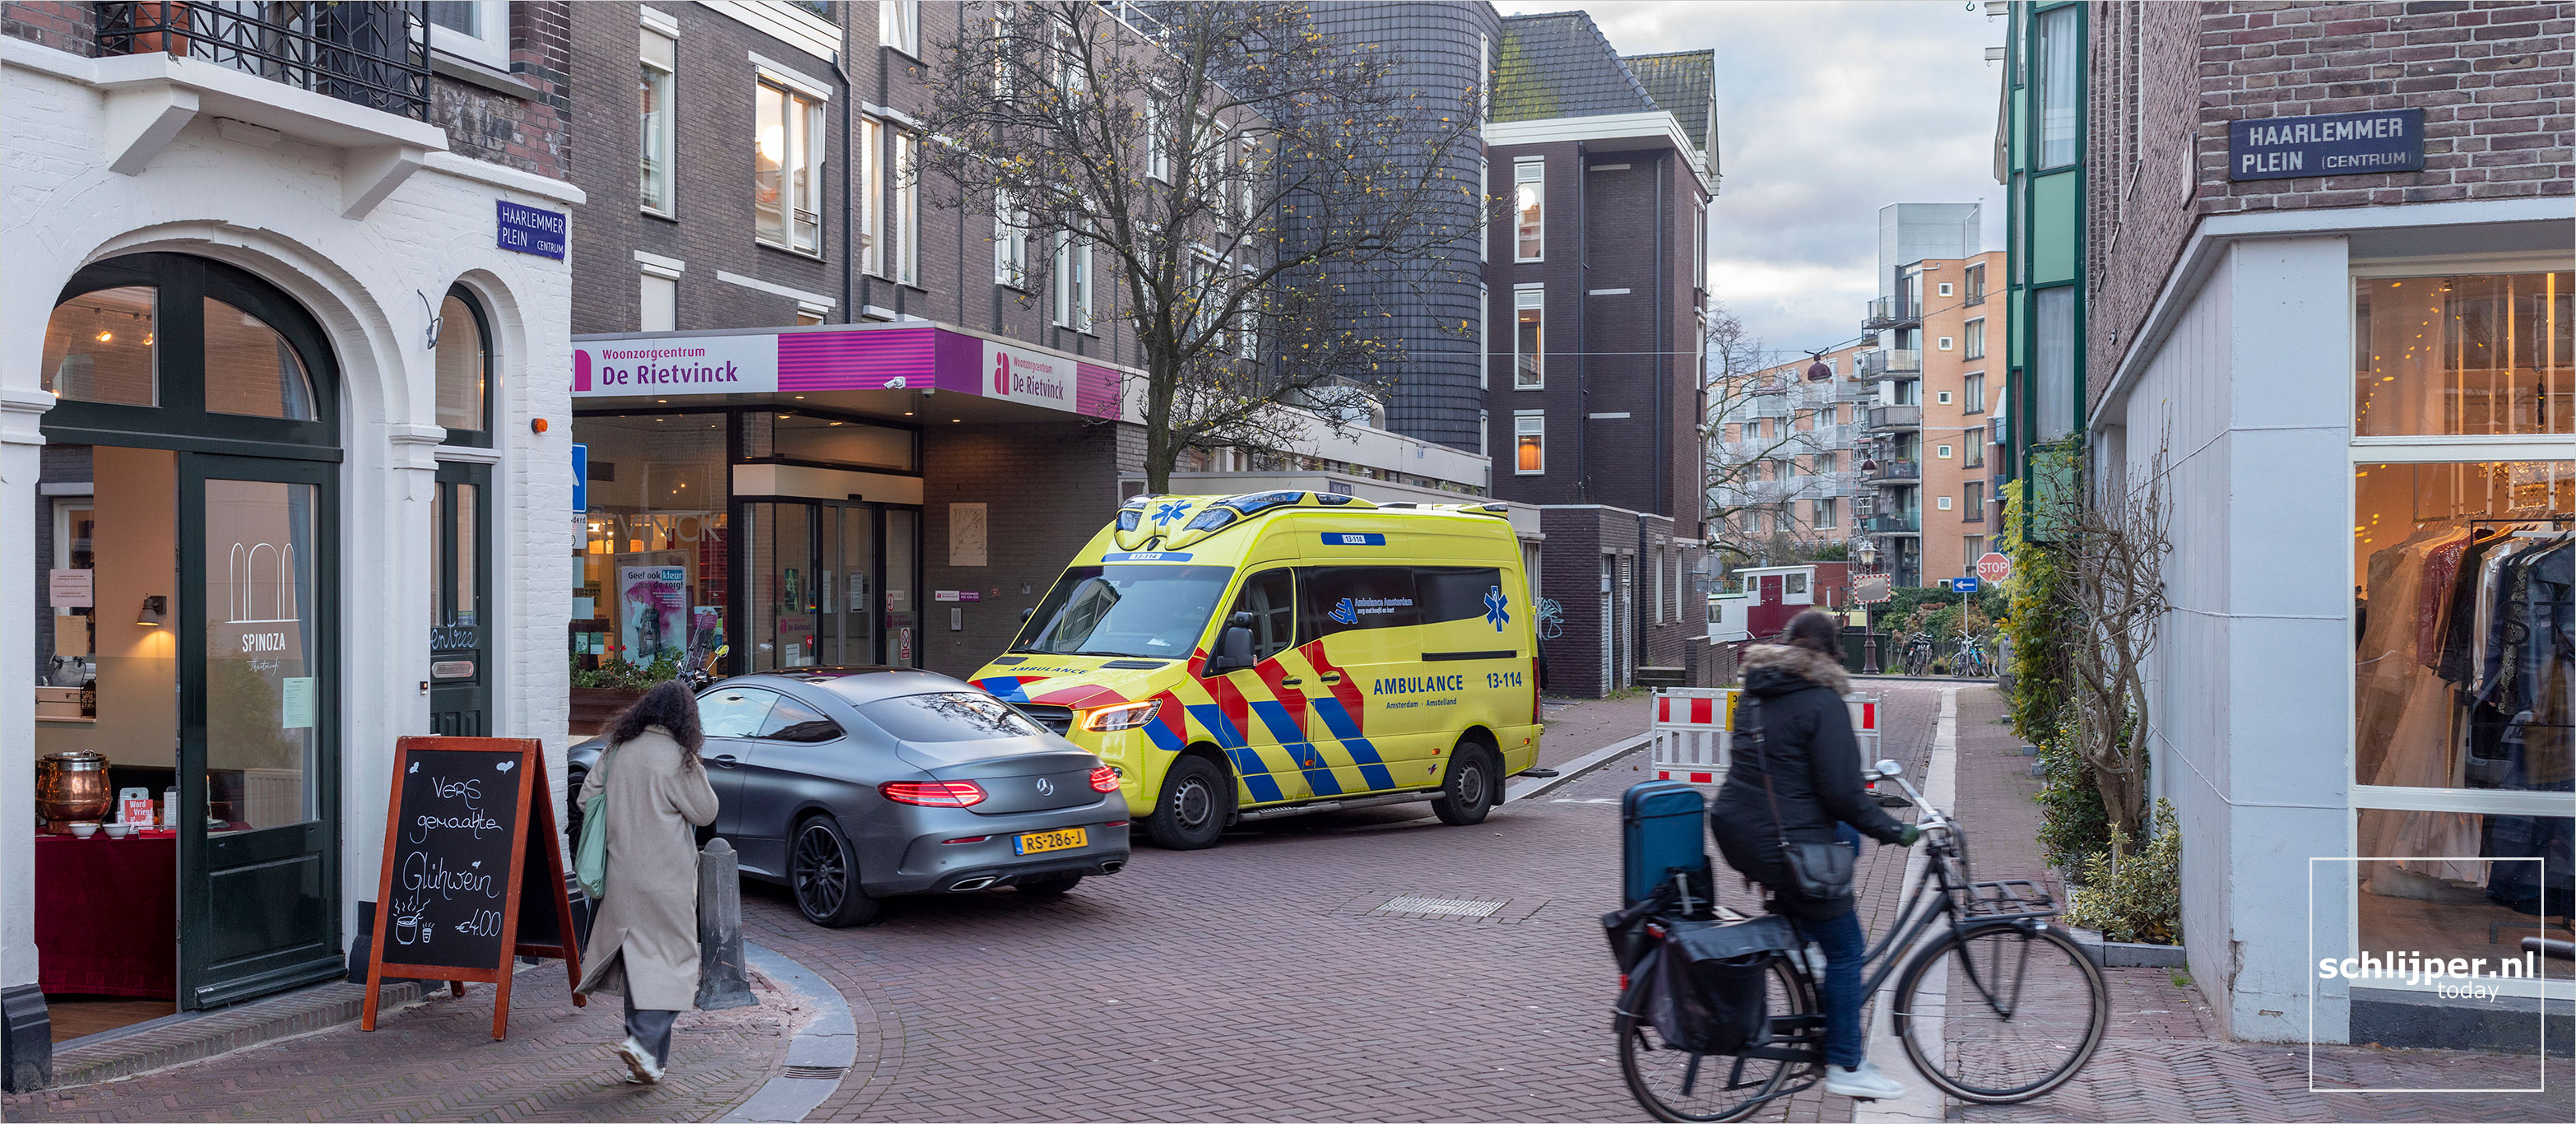 The Netherlands, Amsterdam, 4 december 2020